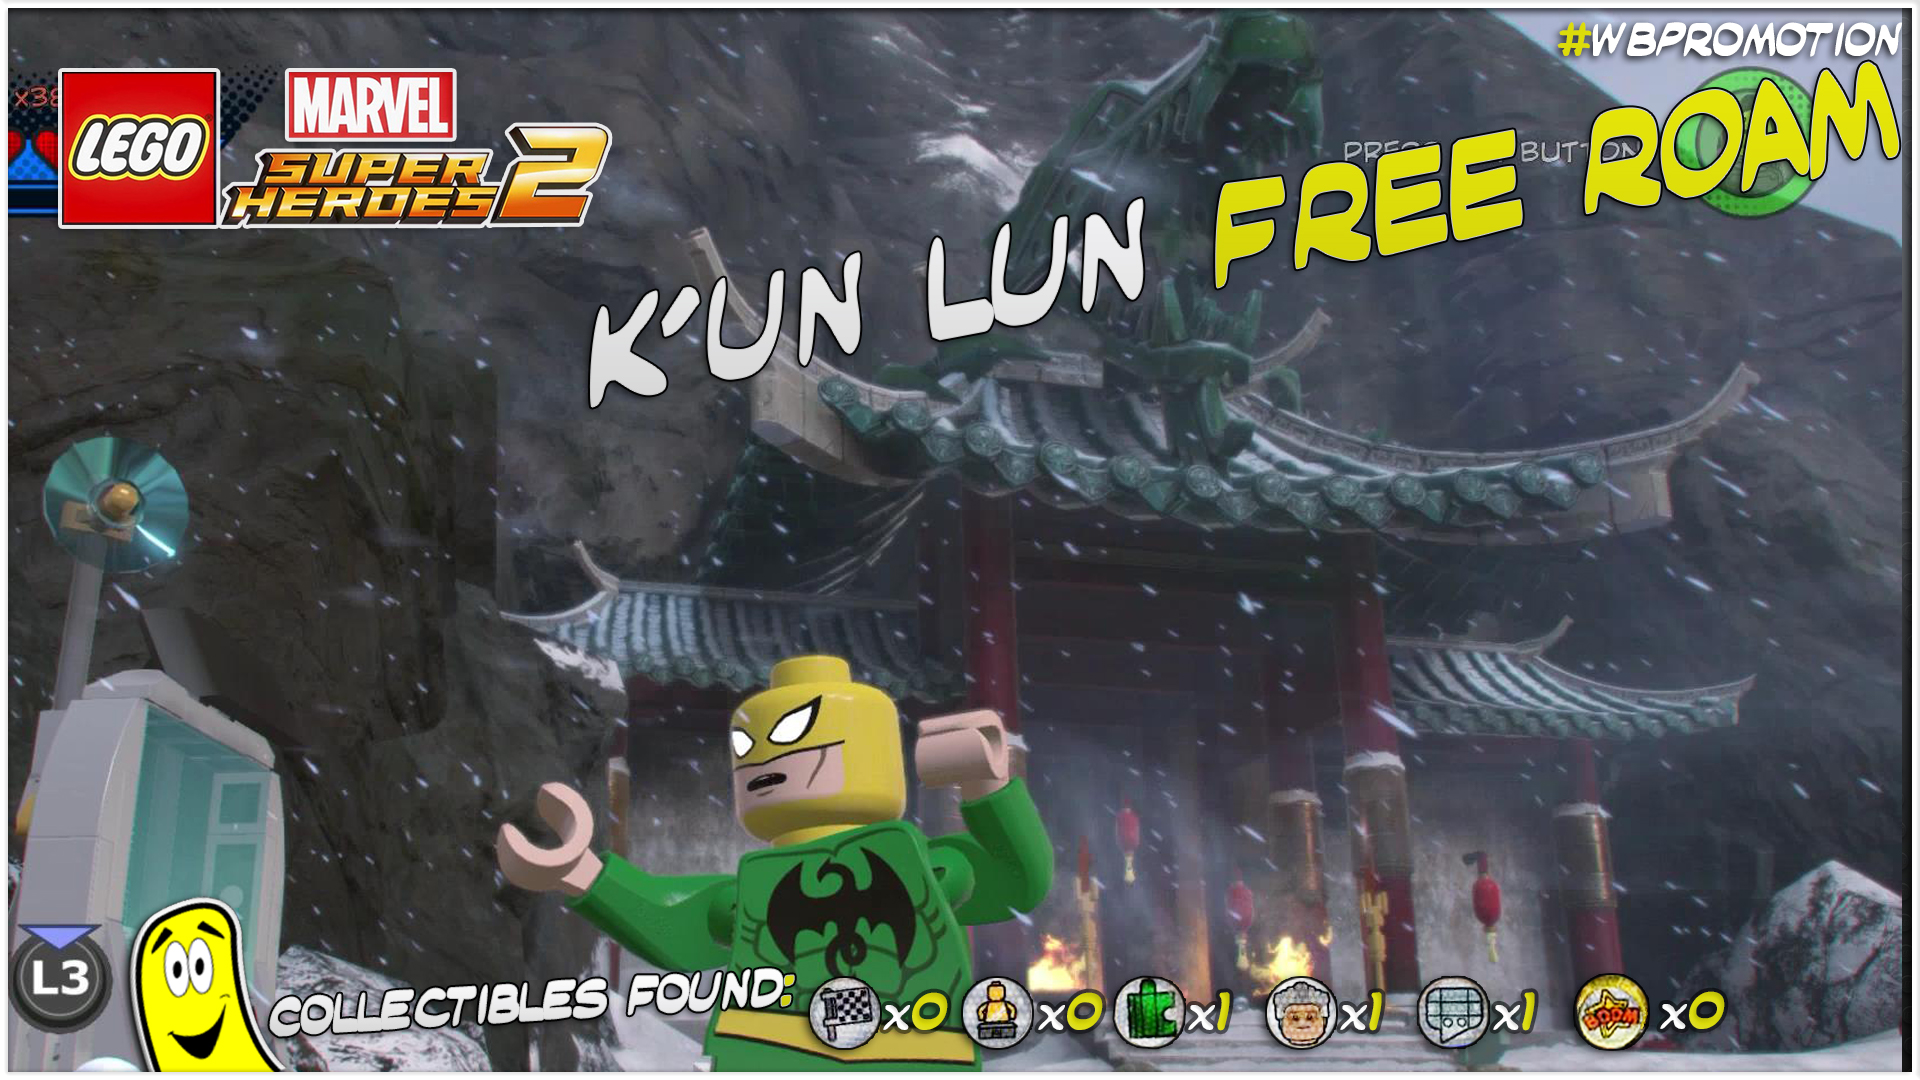 Lego Marvel Superheroes 2: K'un Lun FREE ROAM (All Collectibles) – HTG